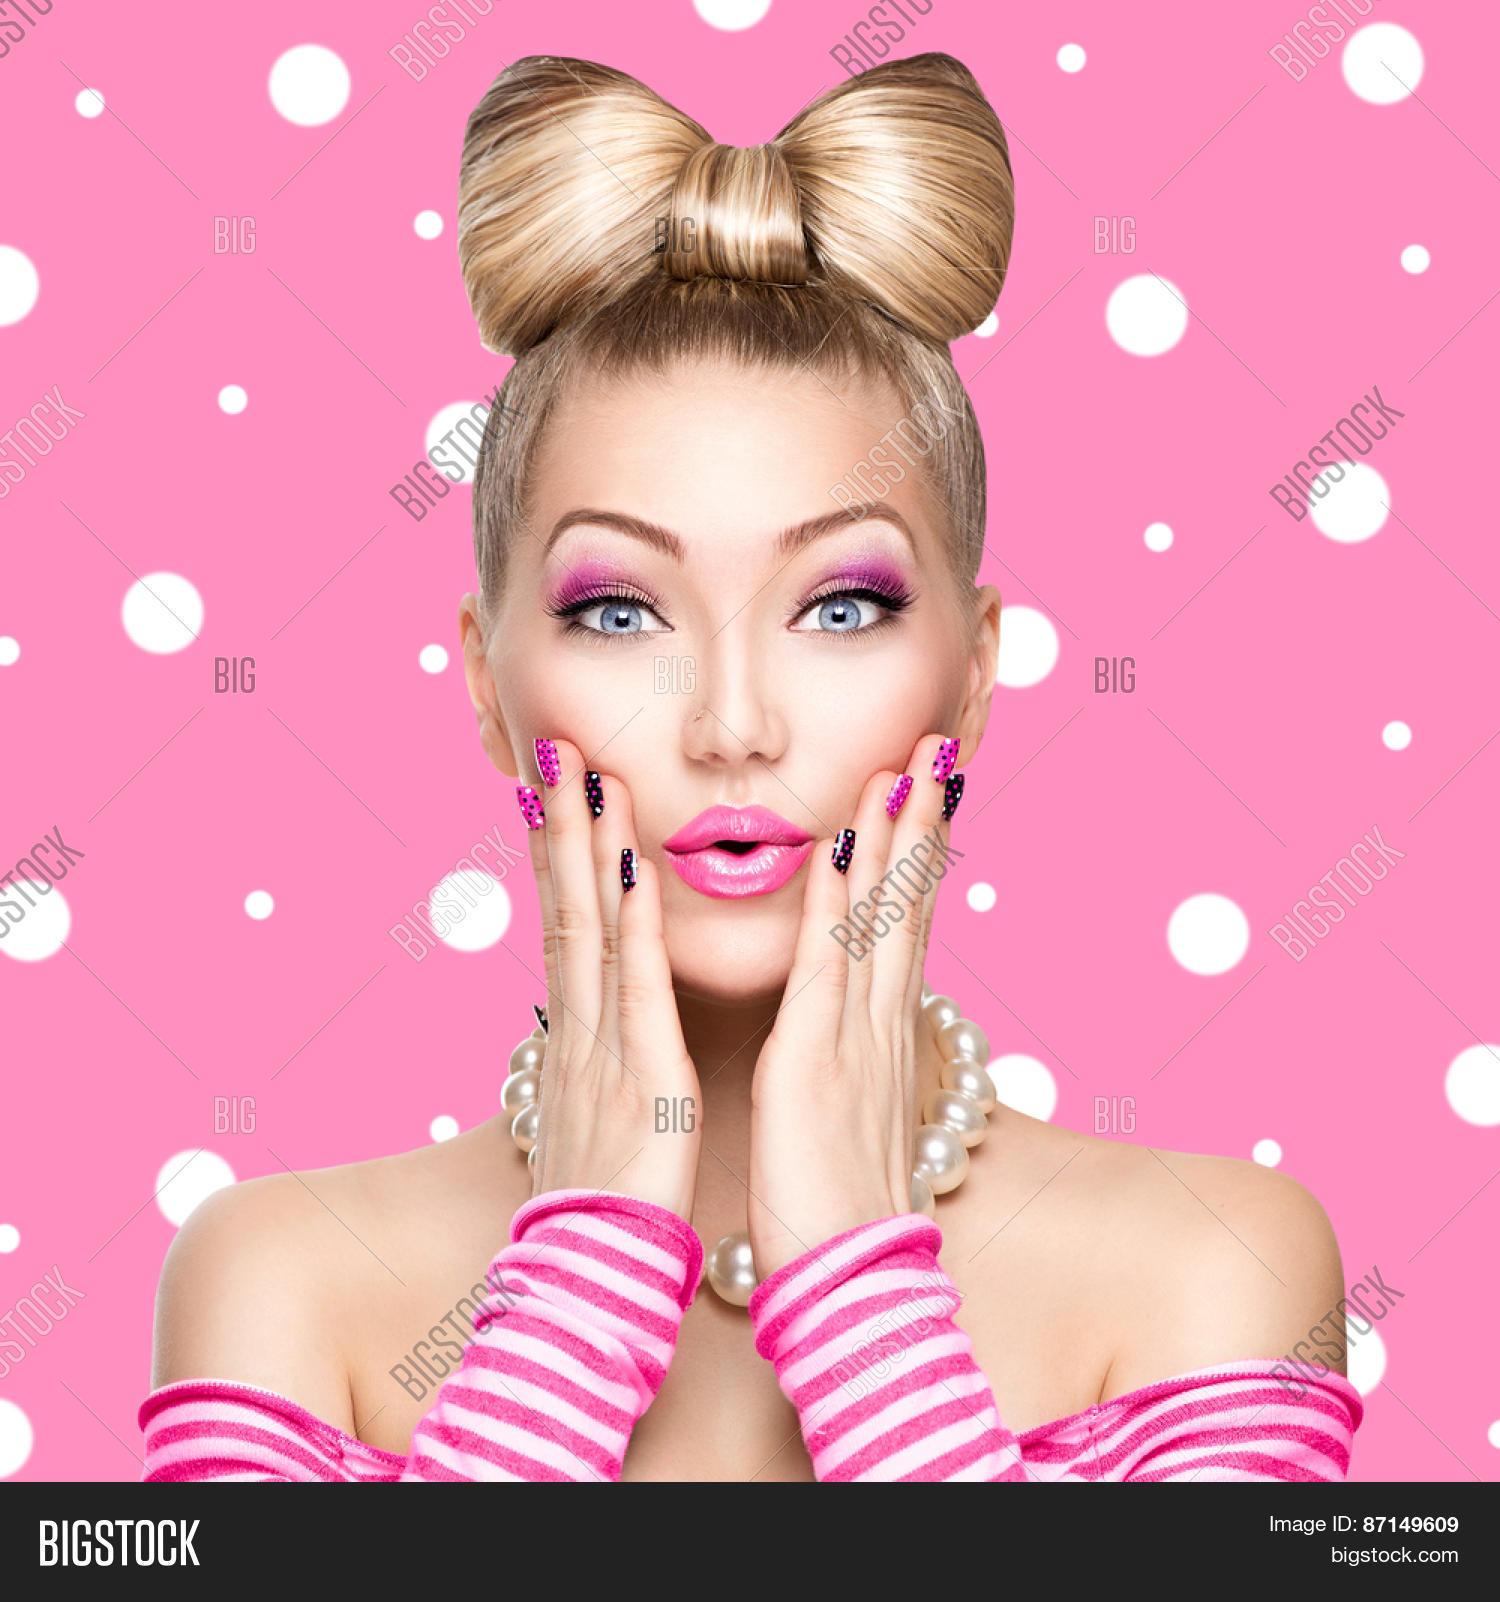 Beauty Surprised Fashion Model Girl Image & Photo